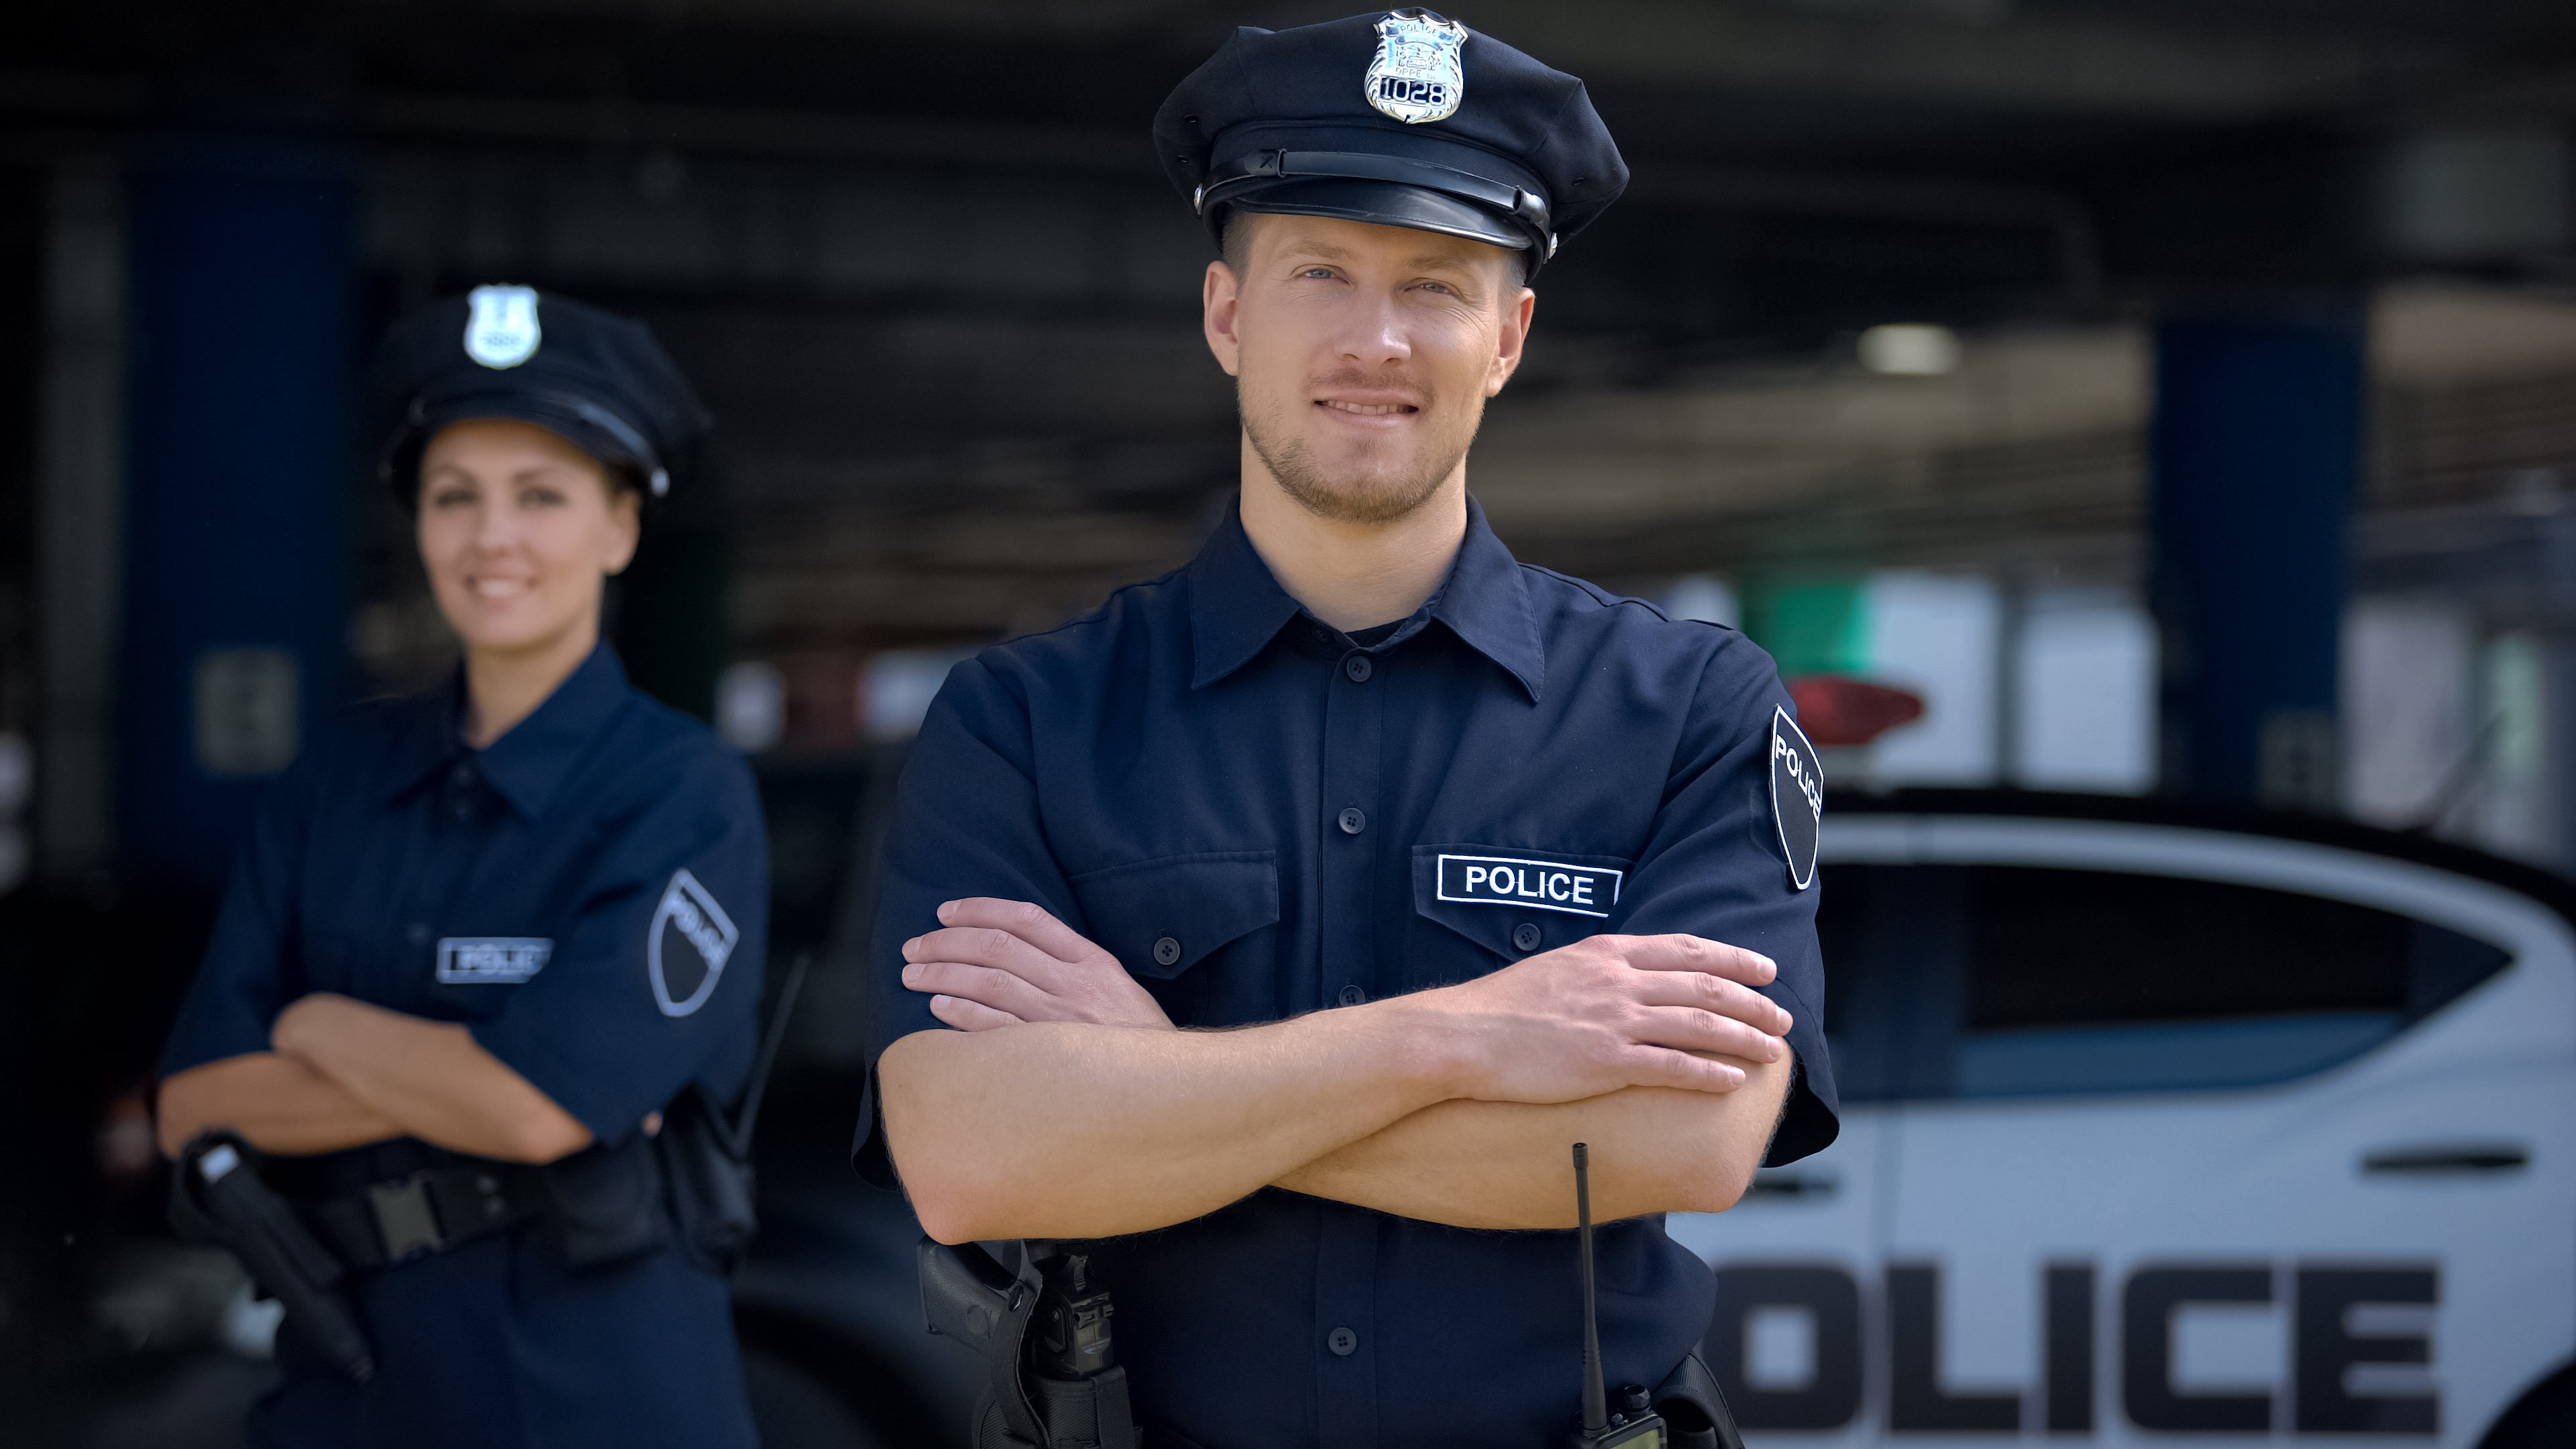 Why Good Cop, Bad Cop in a Negotiation is a Terrible Idea